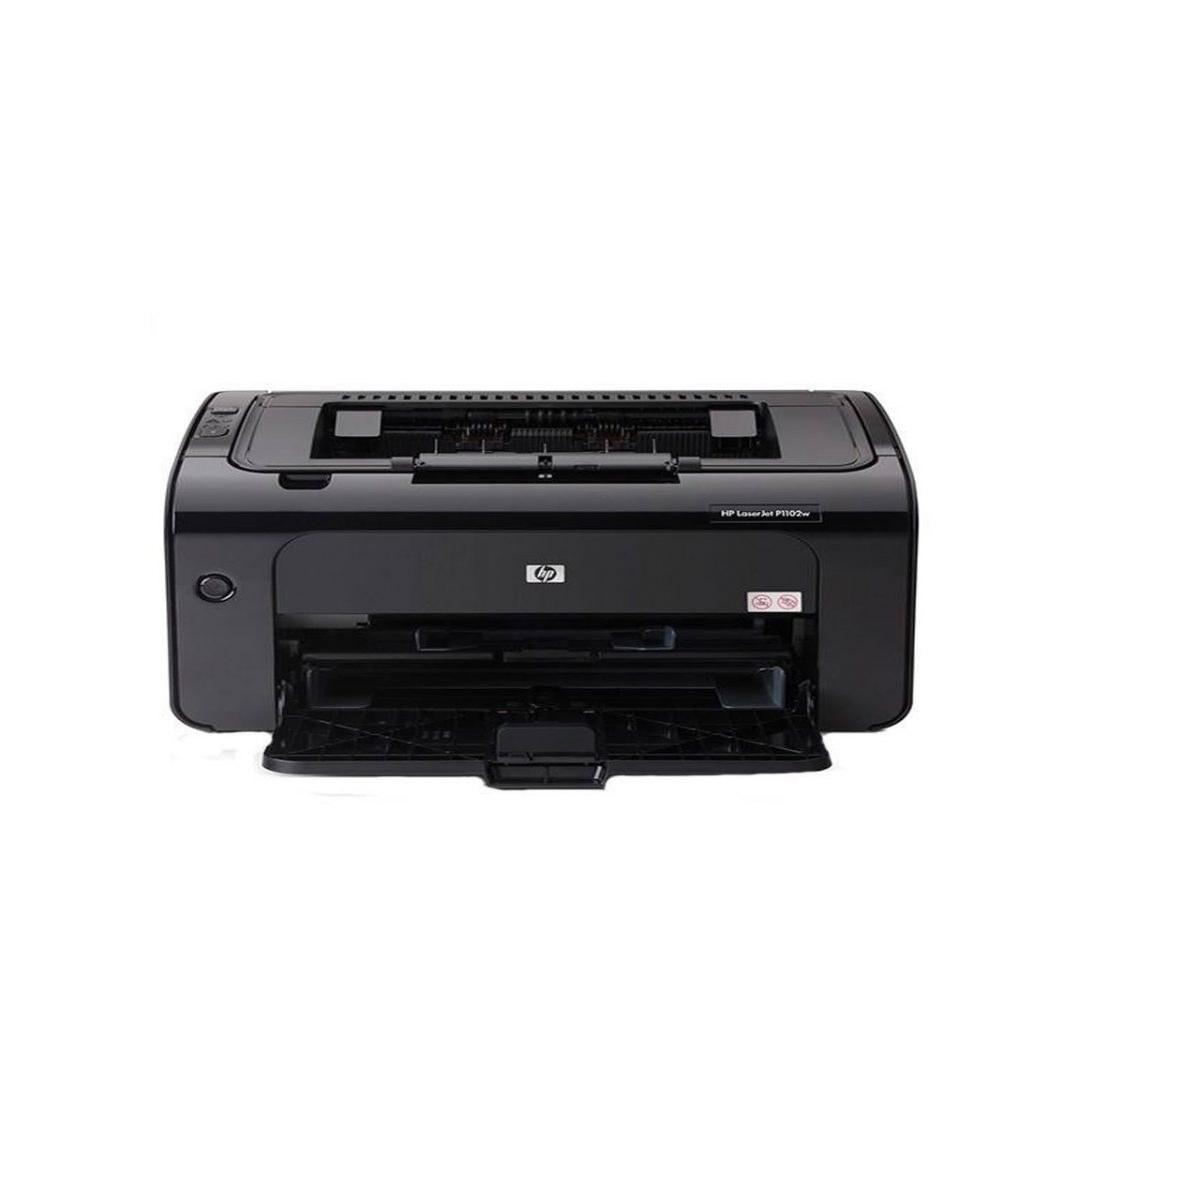 تصویر پرینتر لیزری اچ پی مدل P1102W HP LaserJet P1102W Laser Printer